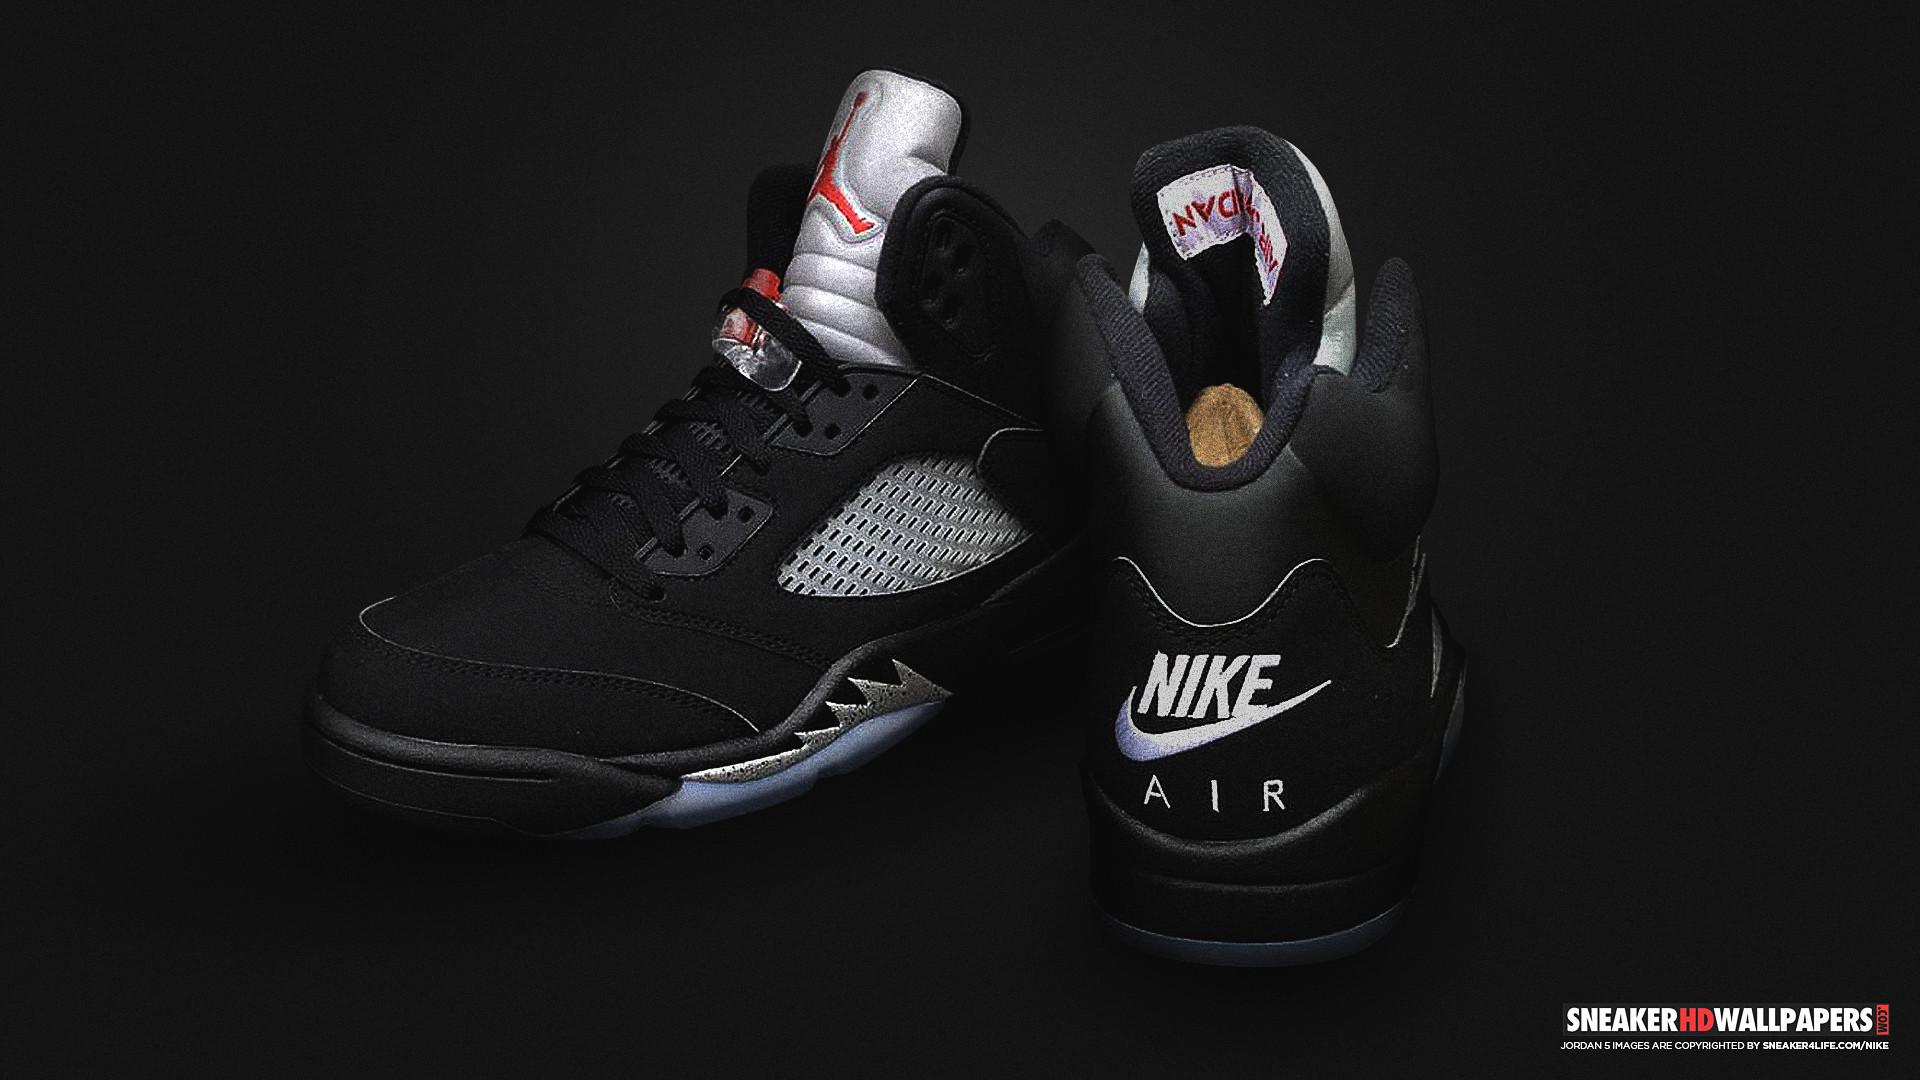 Jordan Shoes Wallpaper Free Download